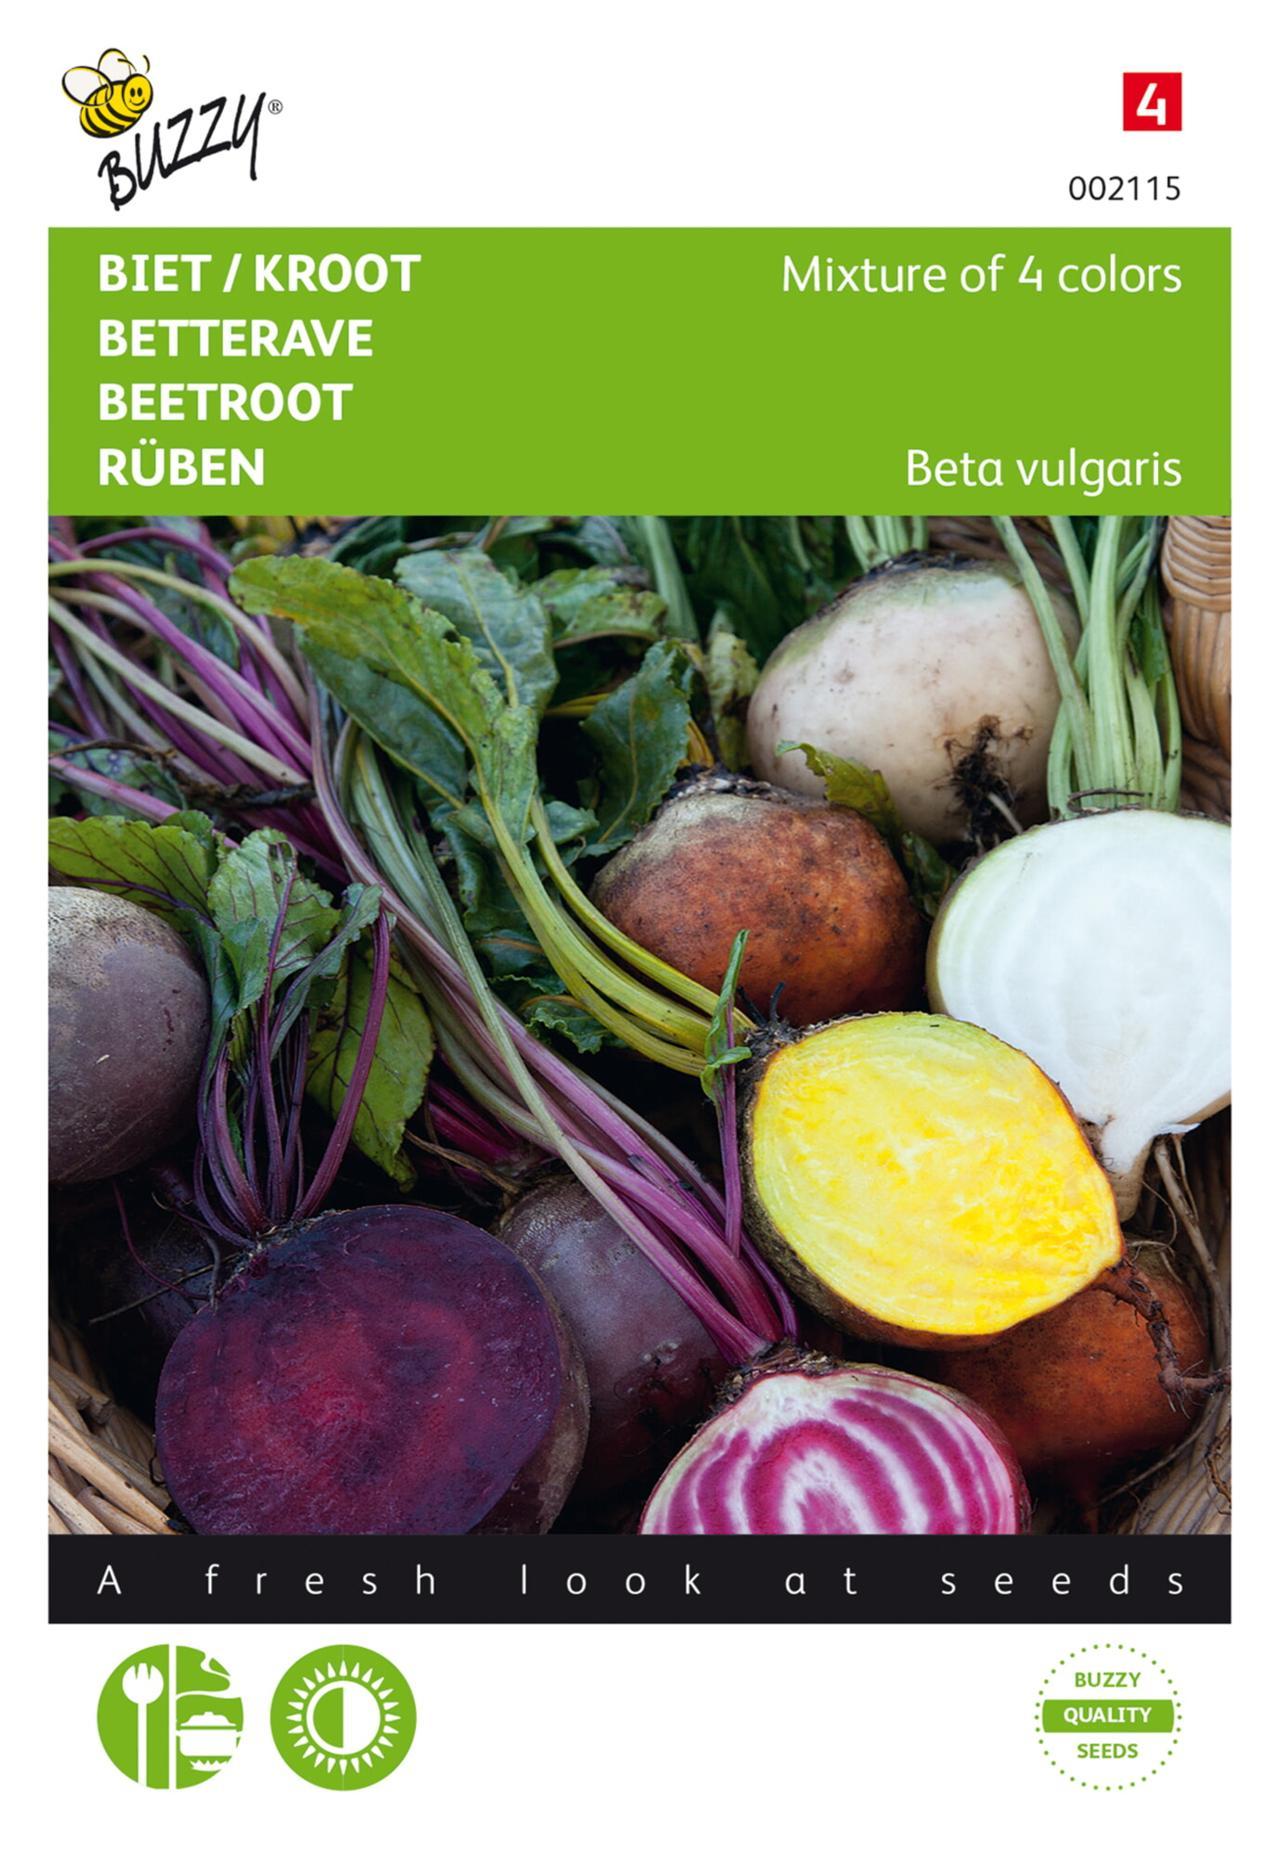 Beta vulgaris 'Mixed colors' plant